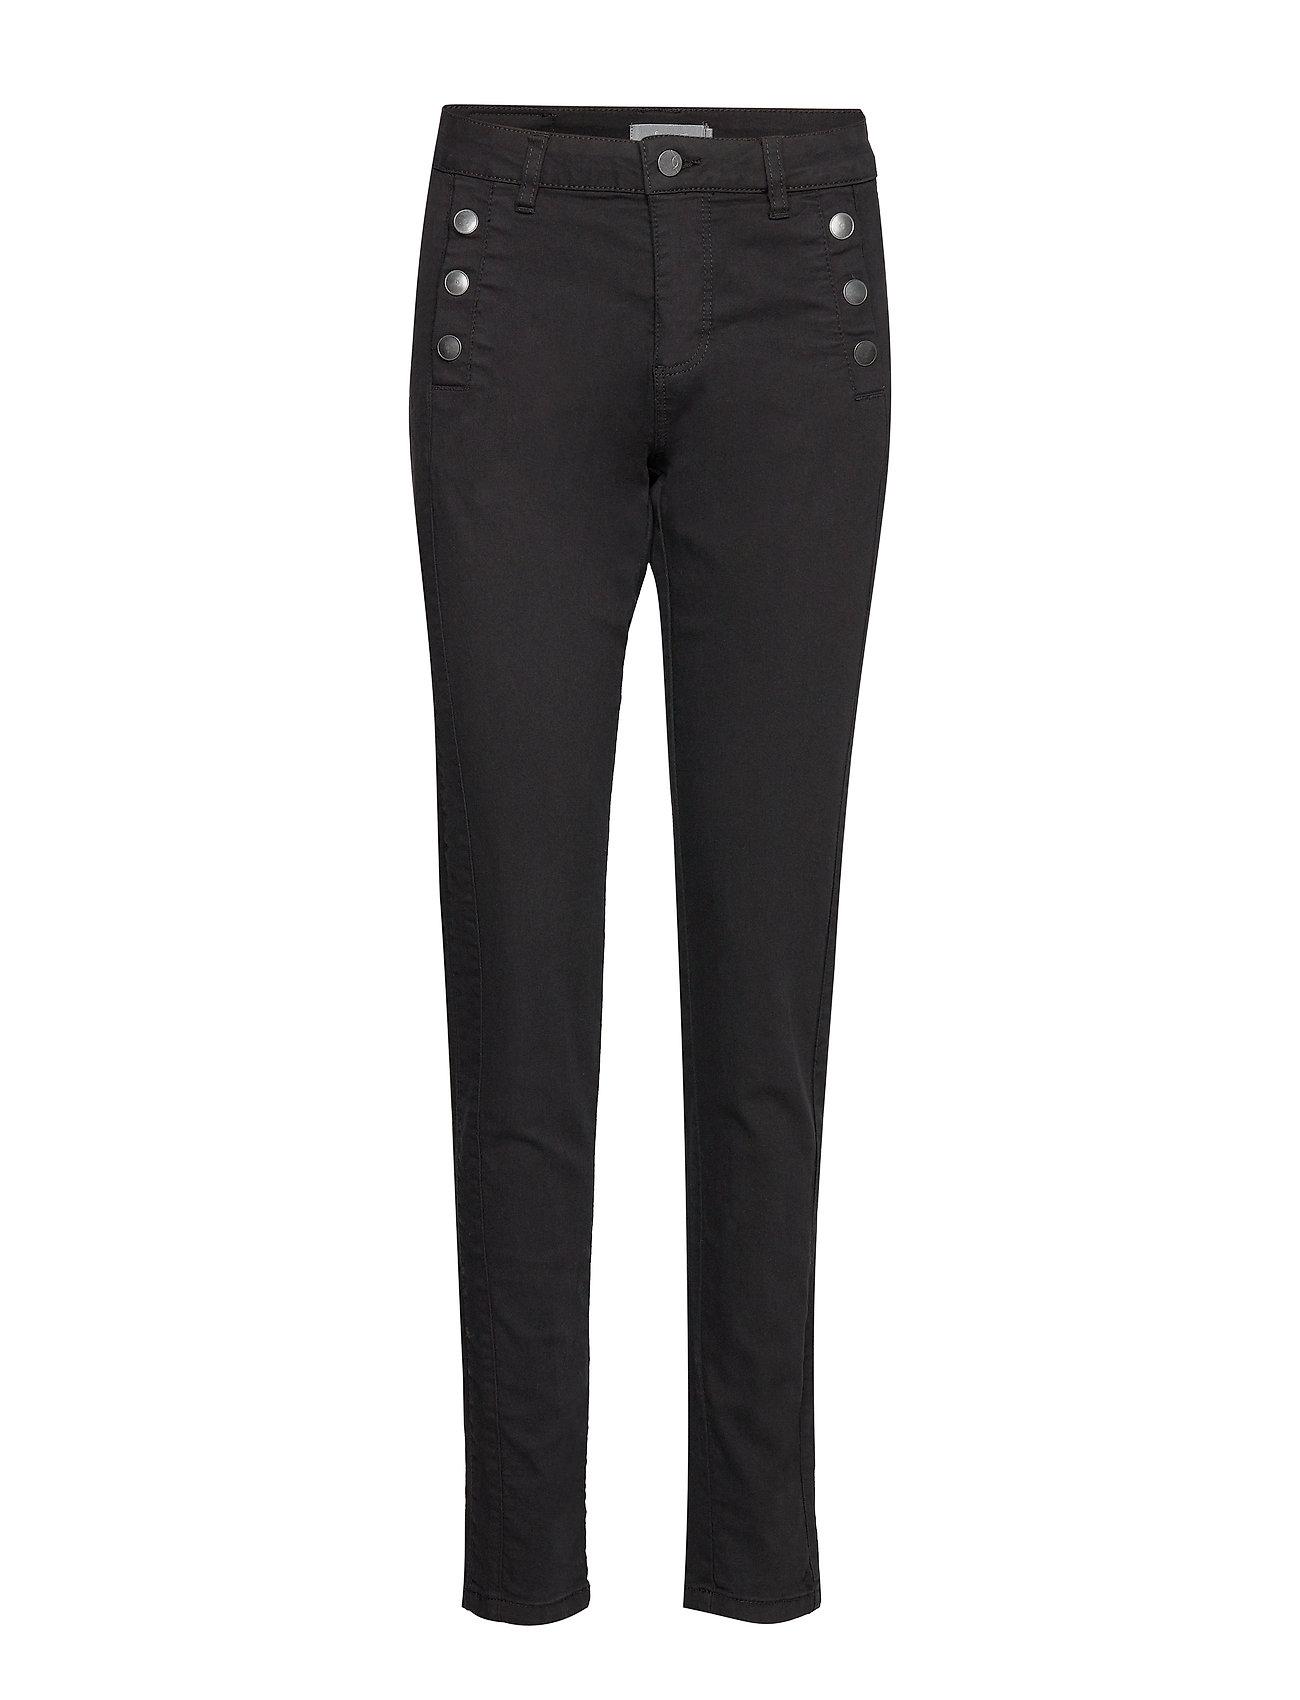 Fransa FRFASNAP 1 Pants - BLACK